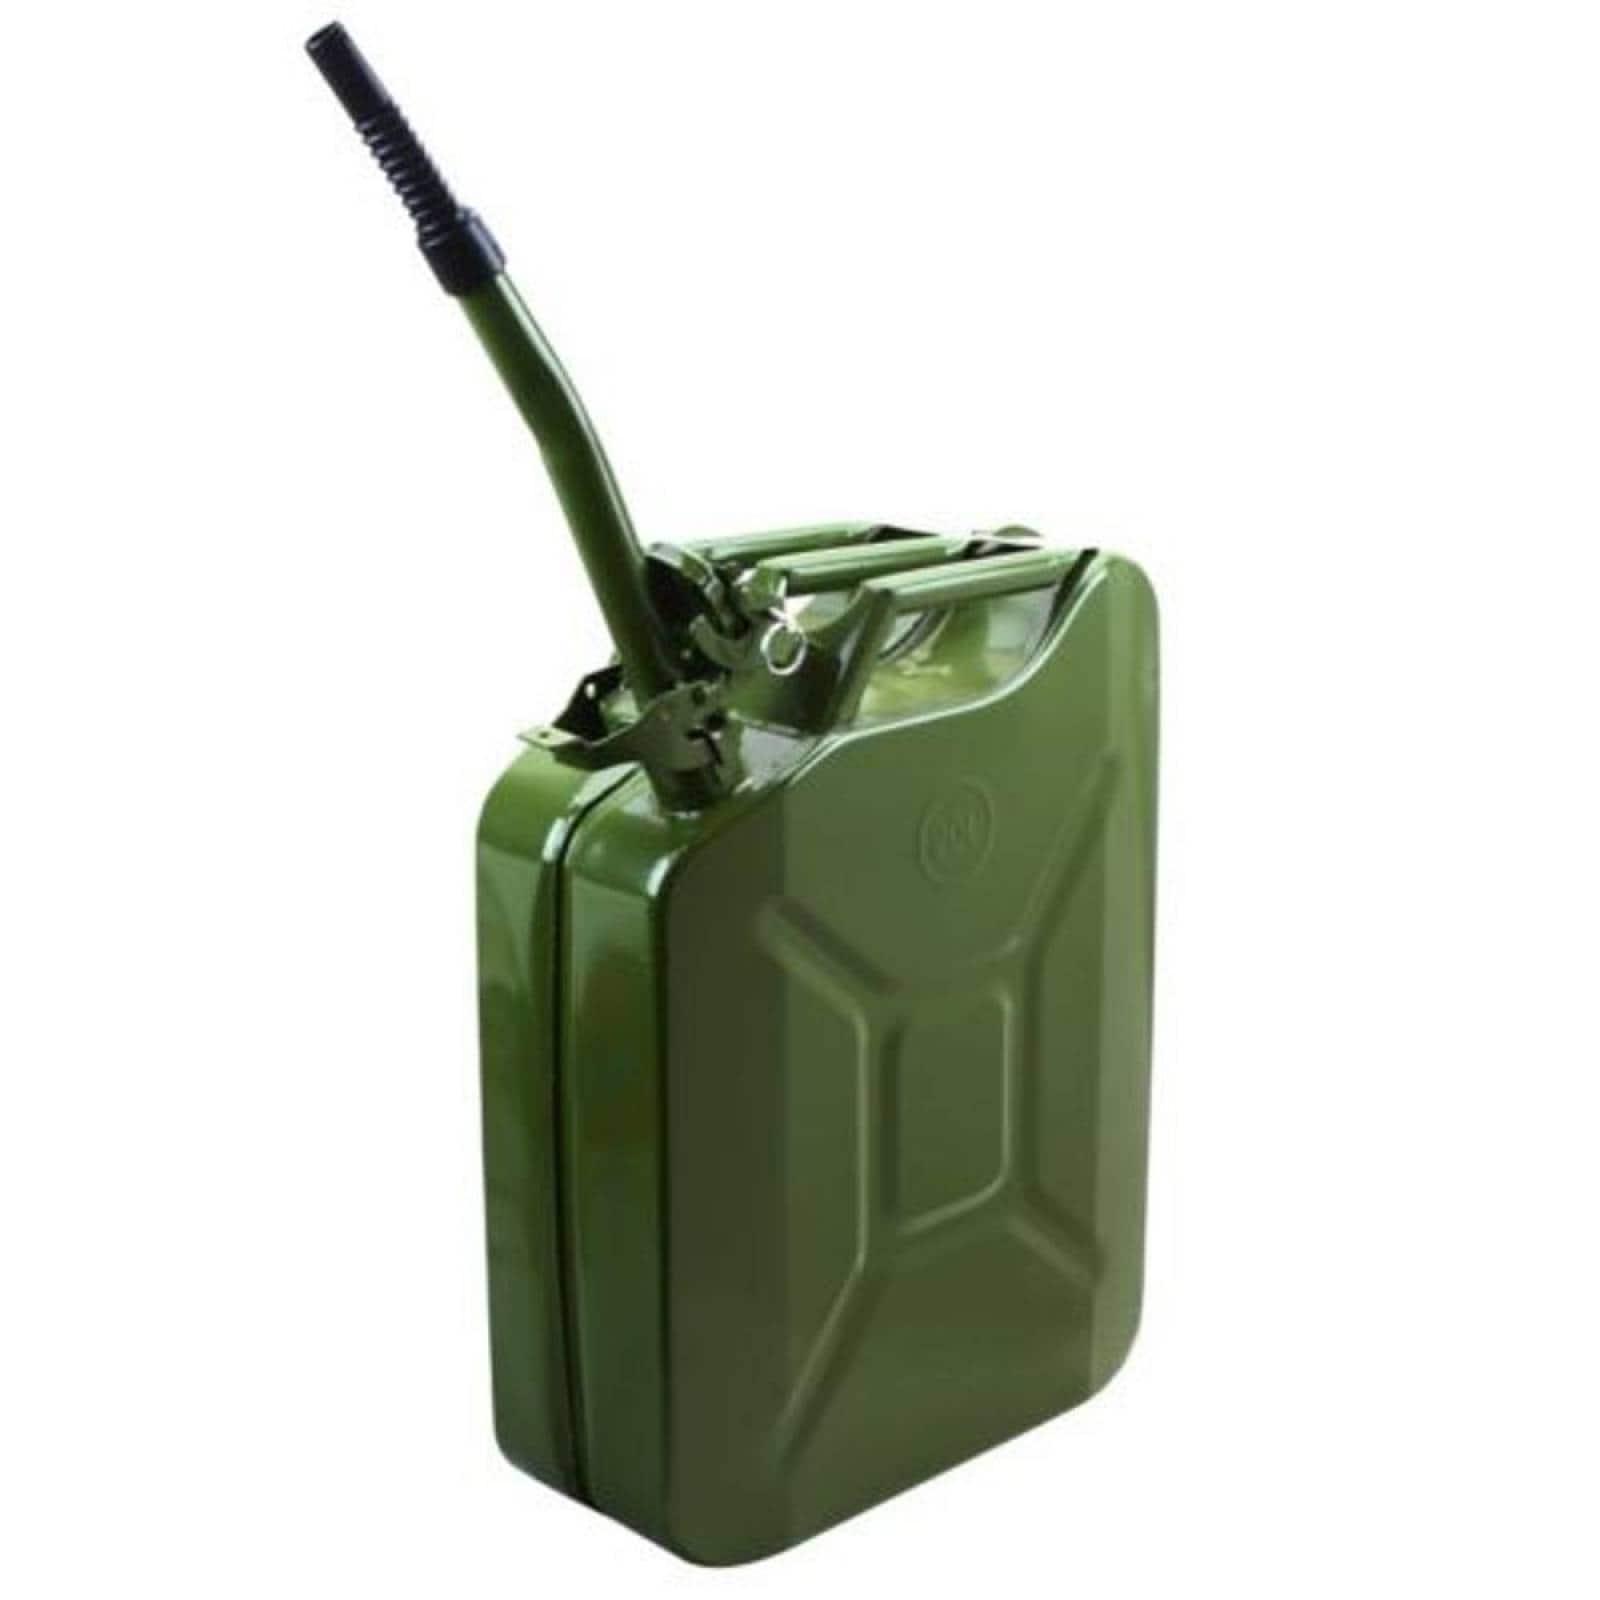 Tanque   Bidon 20 L Gasolina Metalico Verde 20001